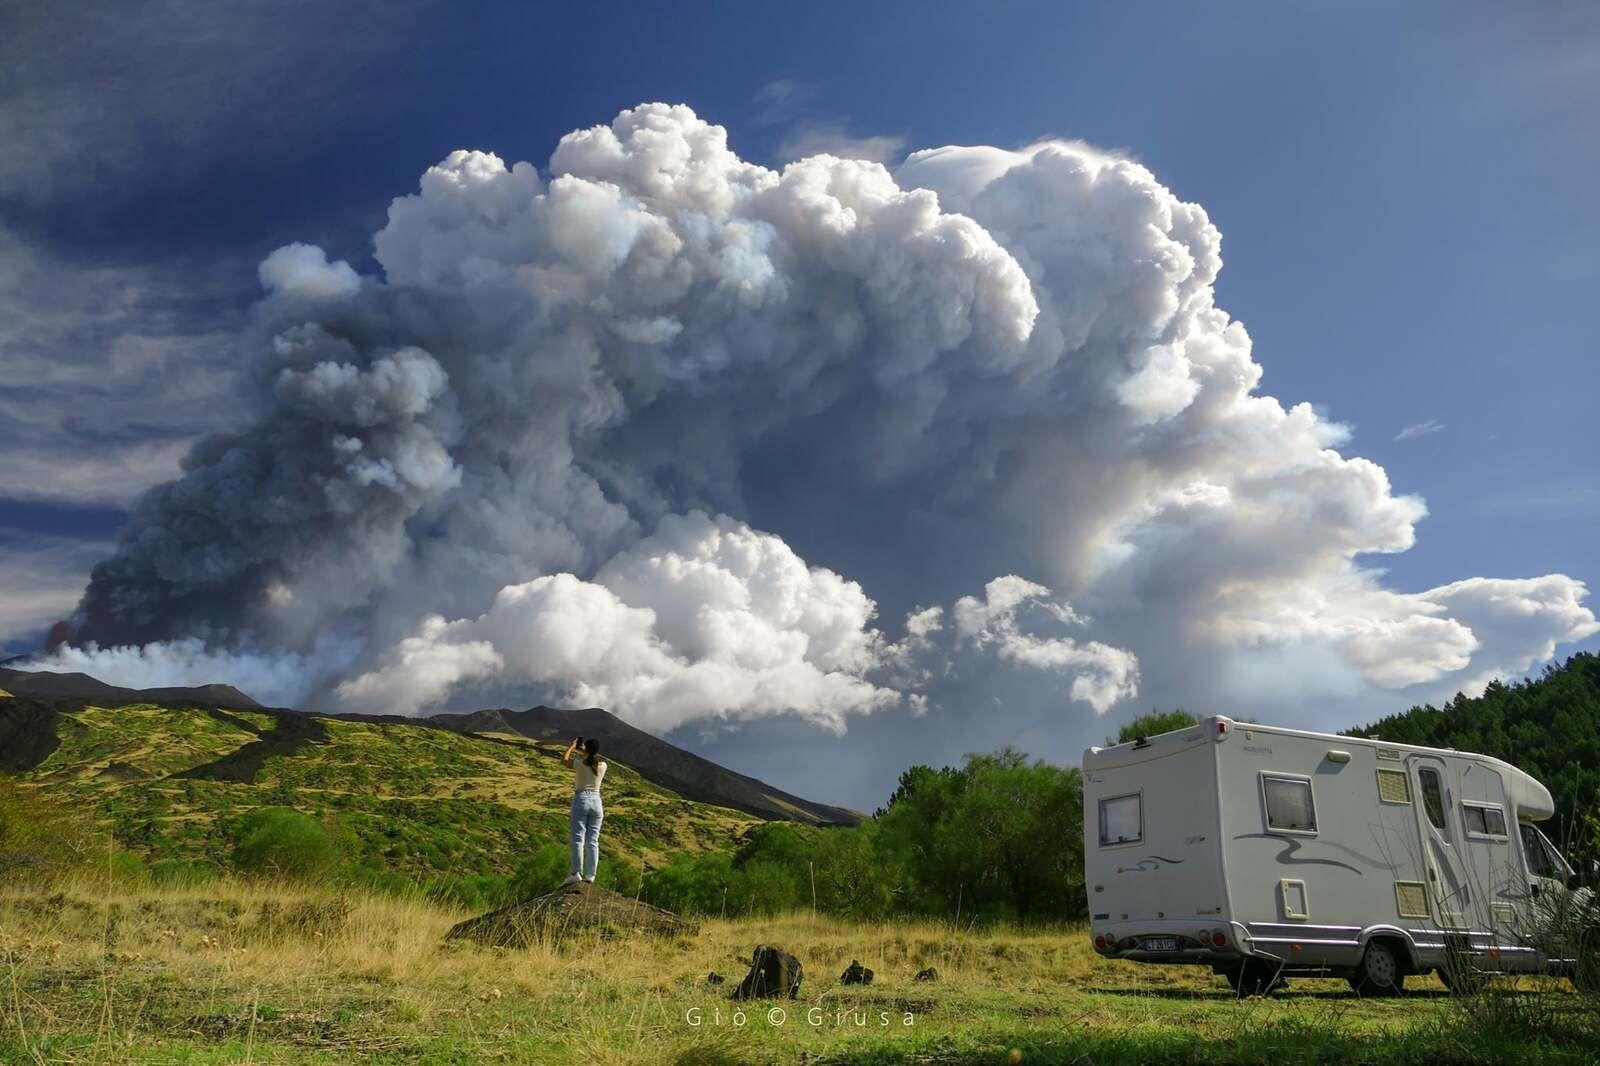 Etna SEC - 21.09.2021 -le 51° Paroxysme vu de Piano Vetore  -  photo Gio Giusa